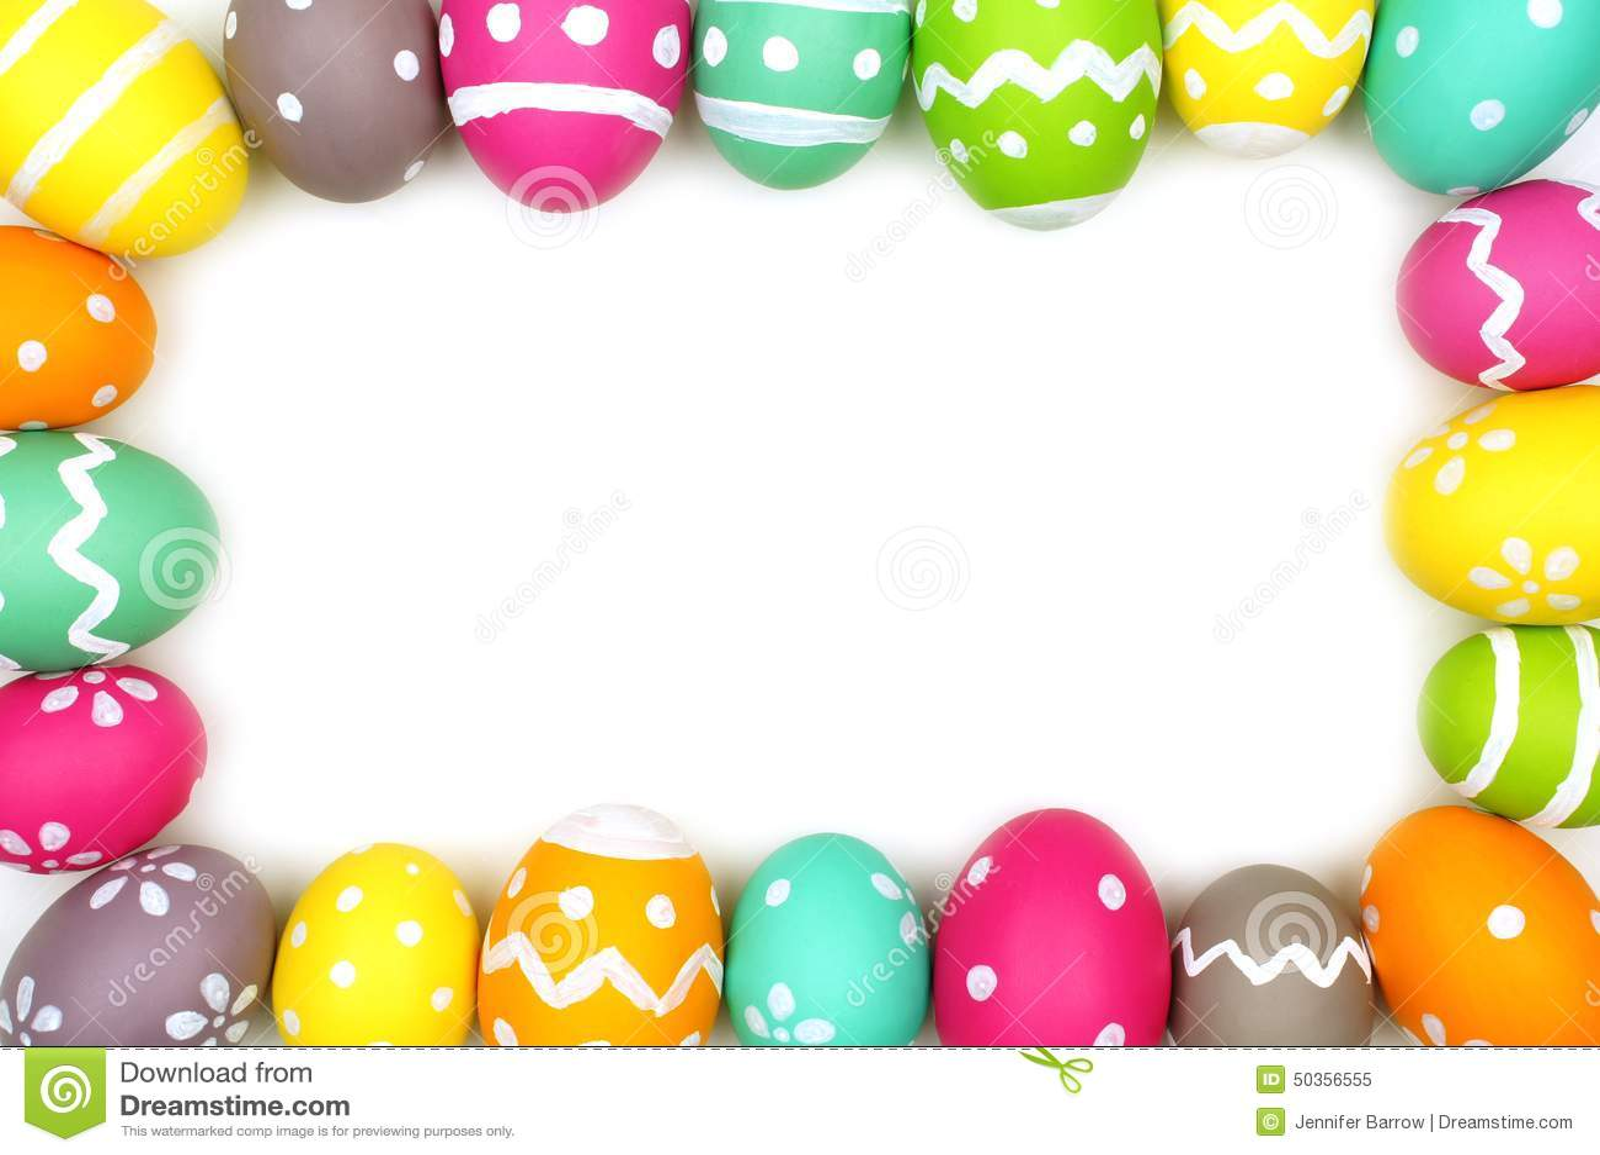 Colorful Easter Egg Frame Stock Image. Image Of Frame